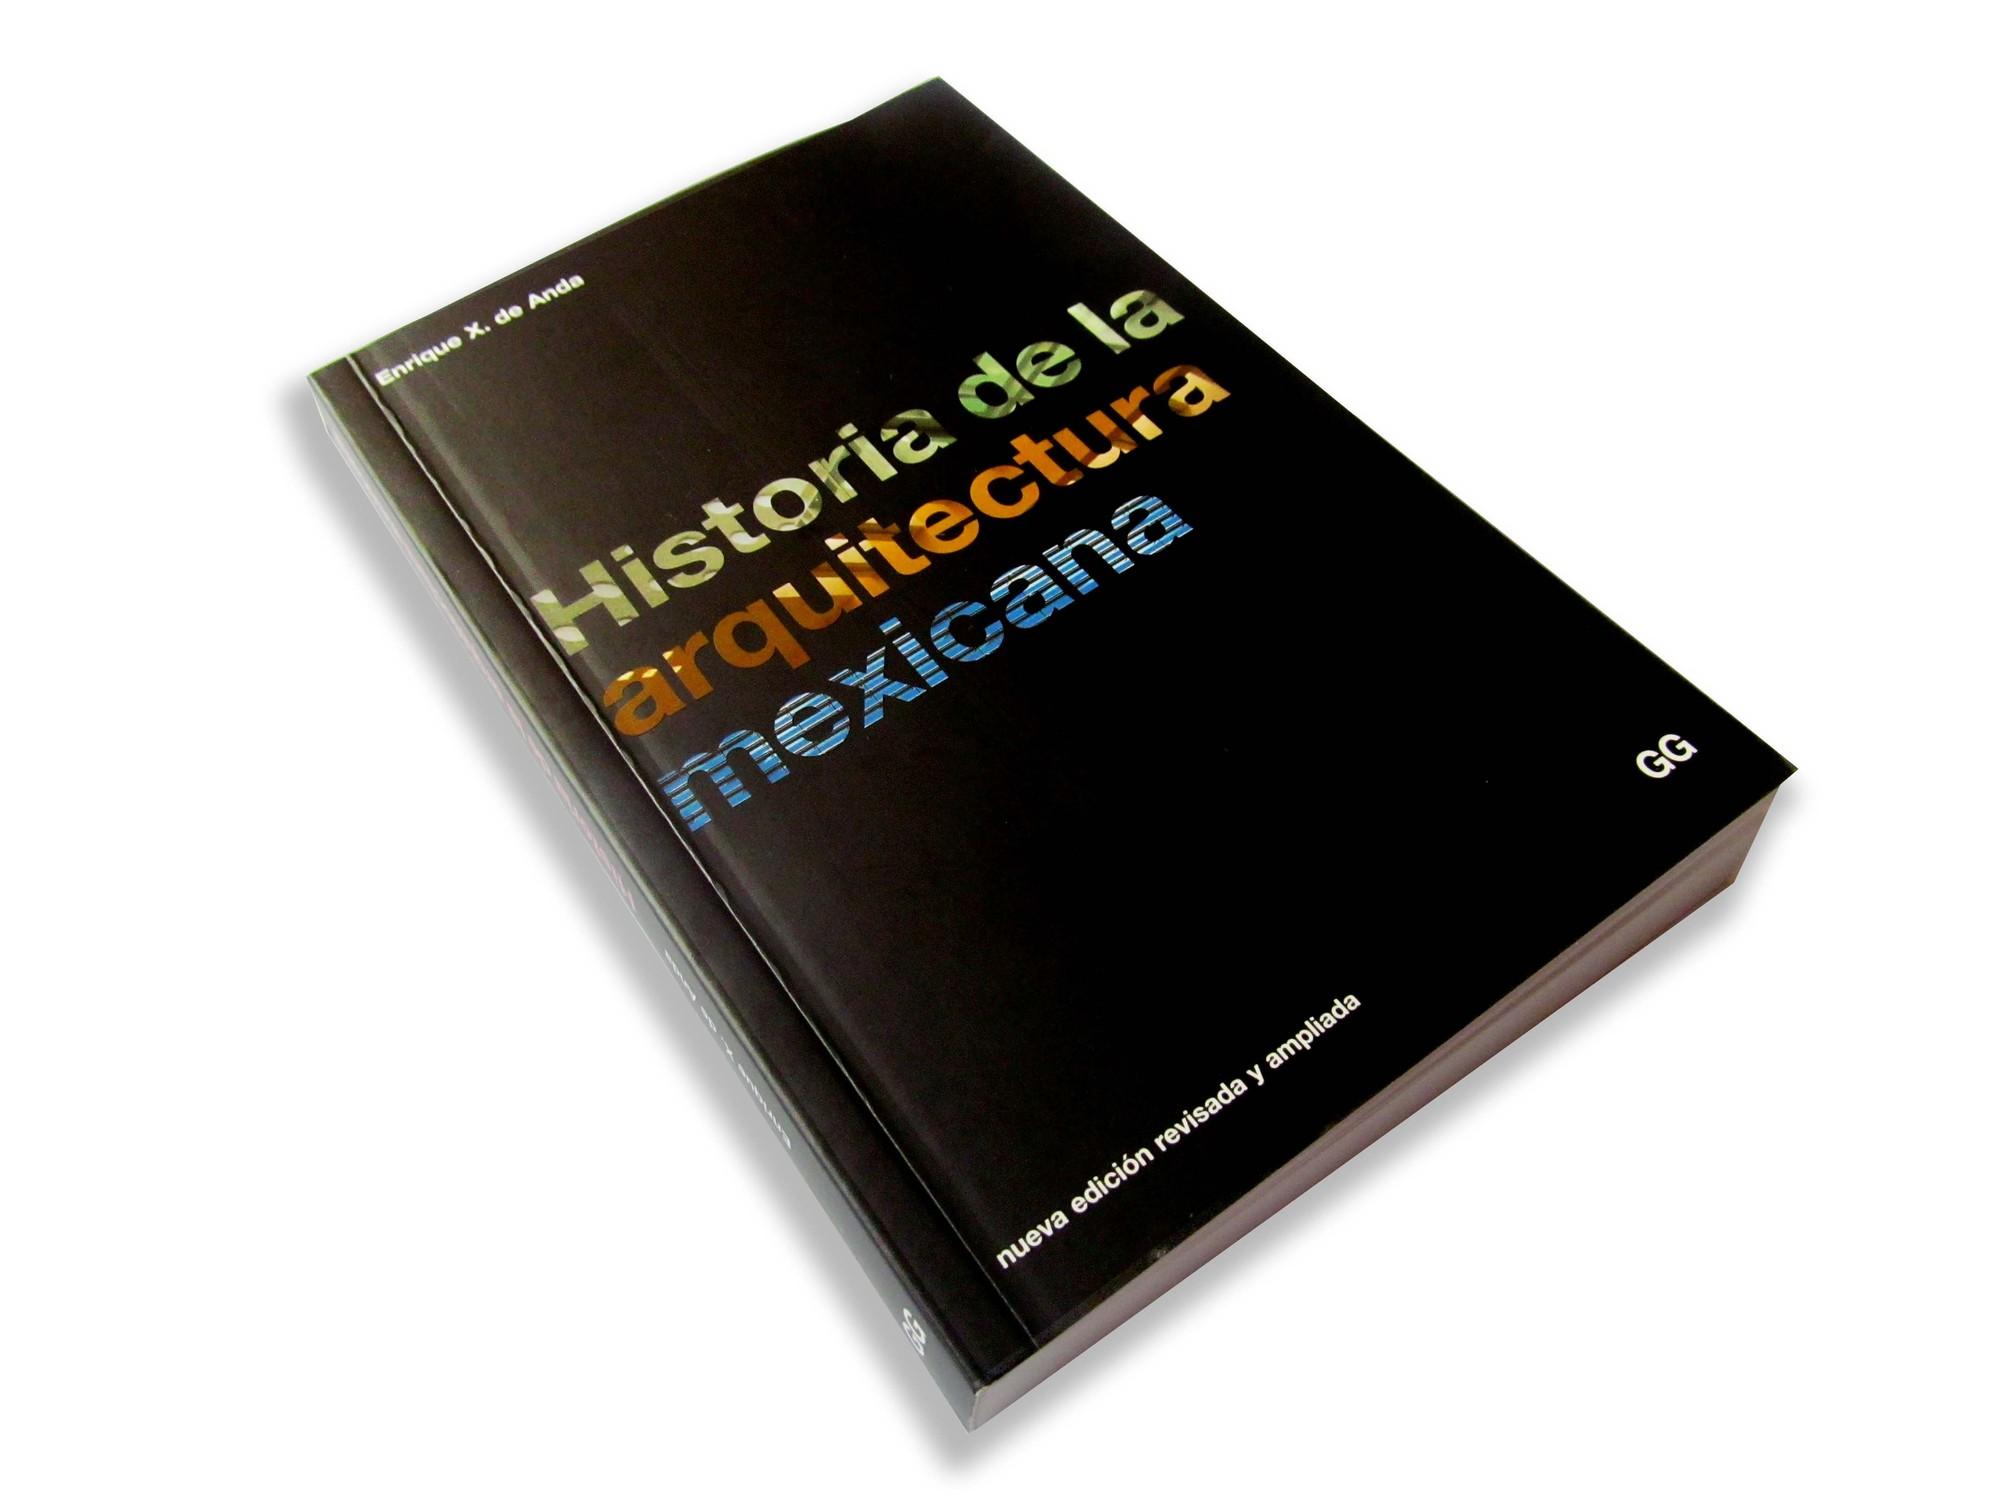 Historia de la arquitectura mexicana / Enrique X. de Anda